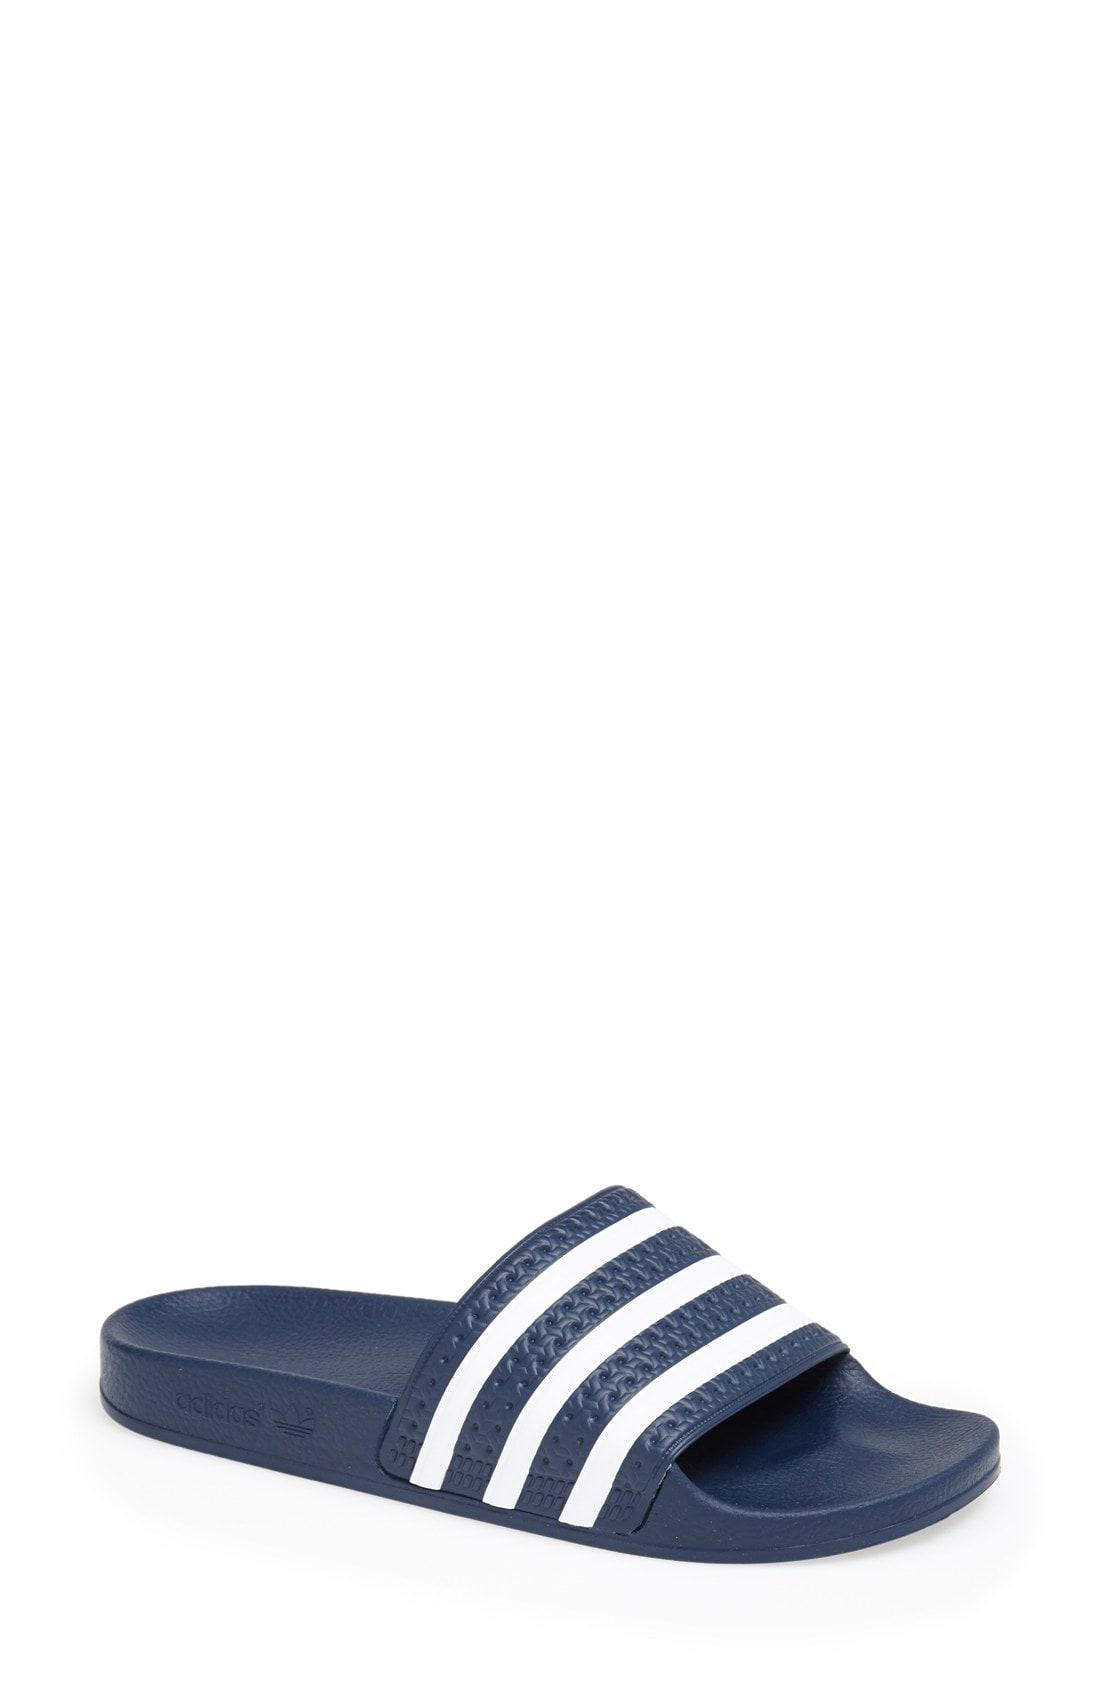 07301facb3c681 Adidas - Blue Adilette Slide Sandals - Lyst. View fullscreen